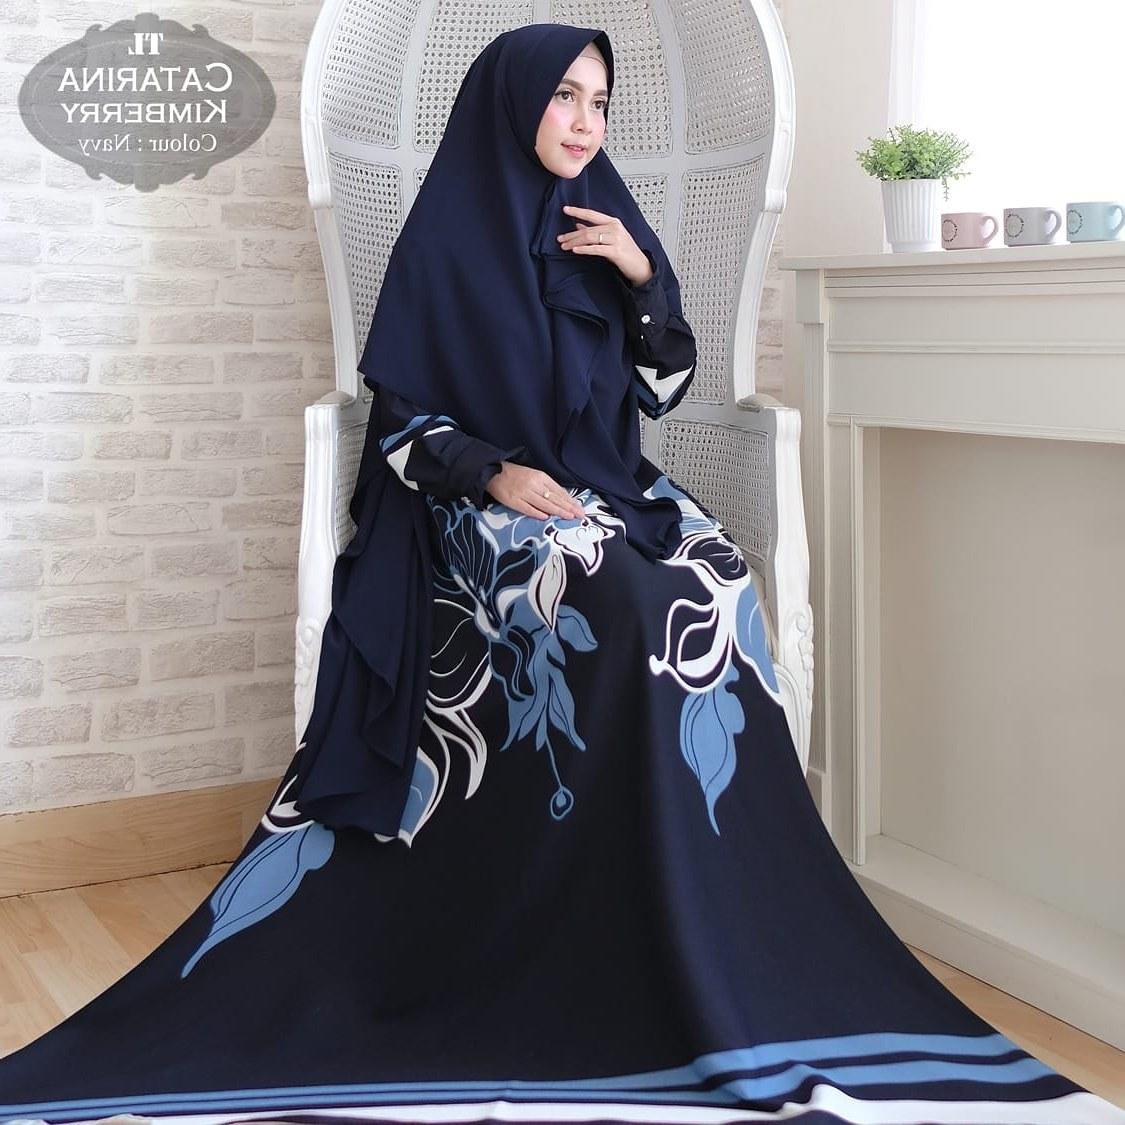 Model Baju Lebaran Tanah Abang 2018 Zwd9 Jual Baju Gamis Syar'i Bahan Catarina Import G8001 Cipulir